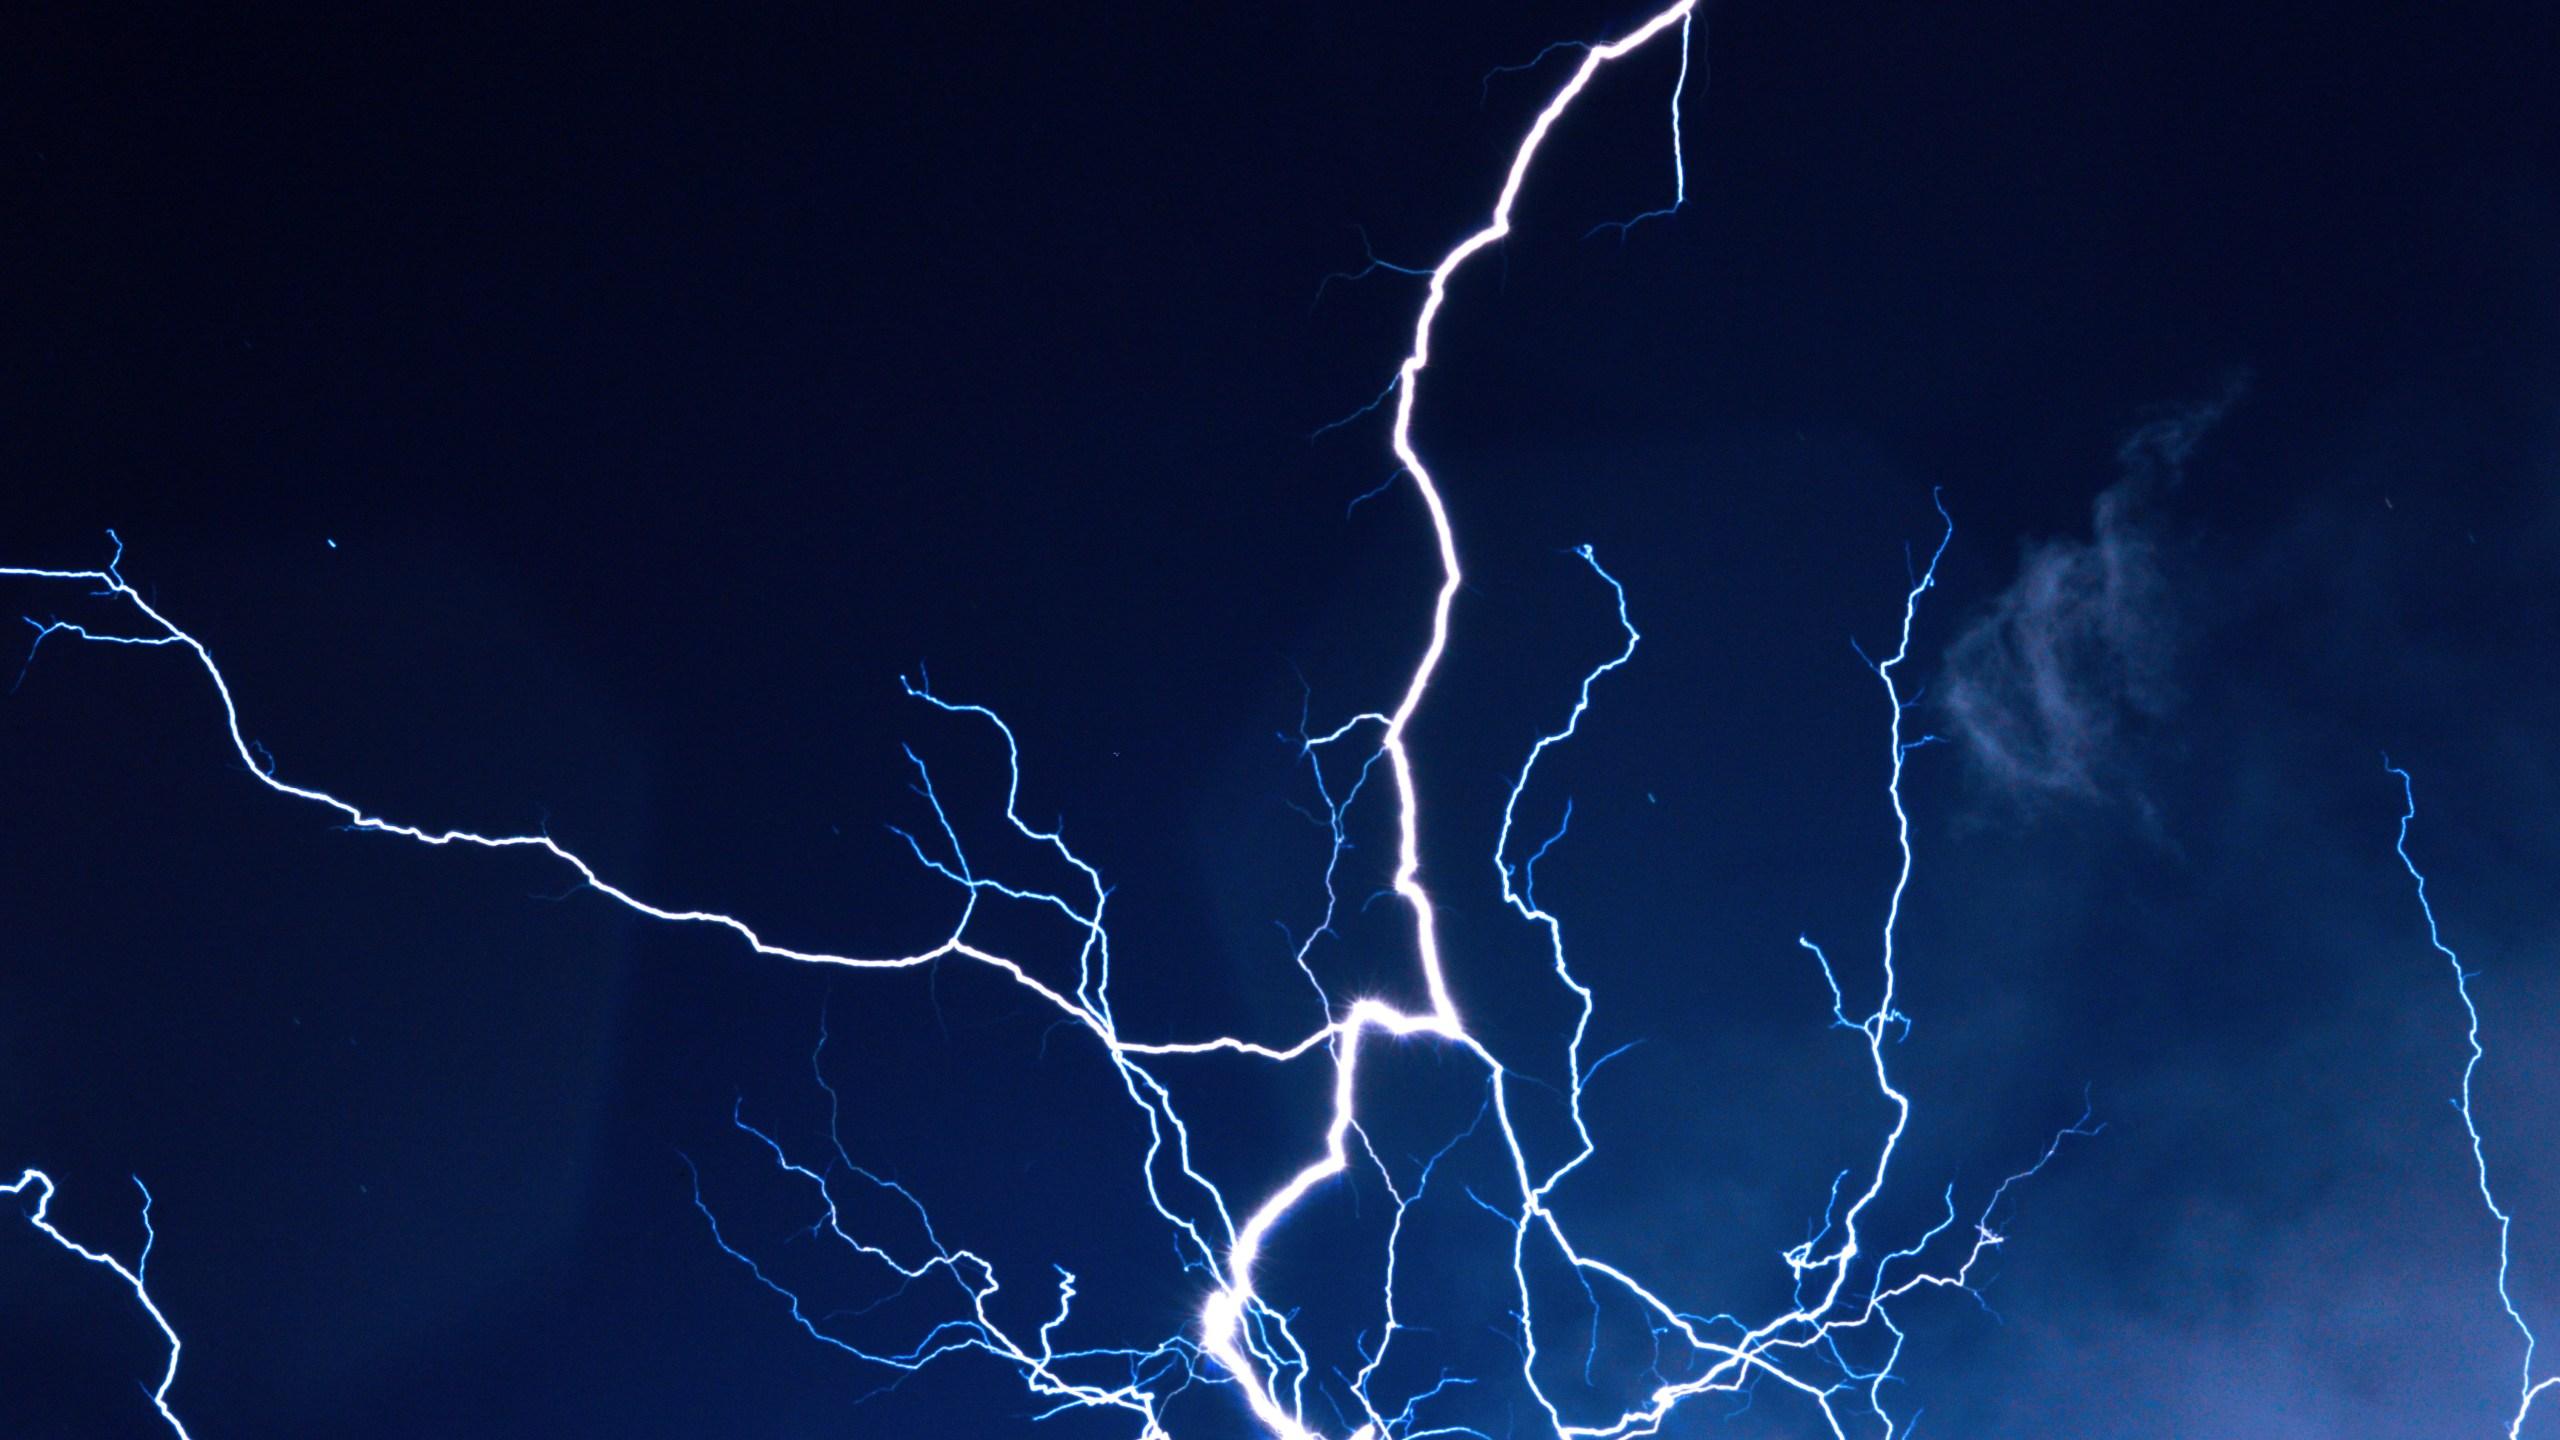 lightning new_291110